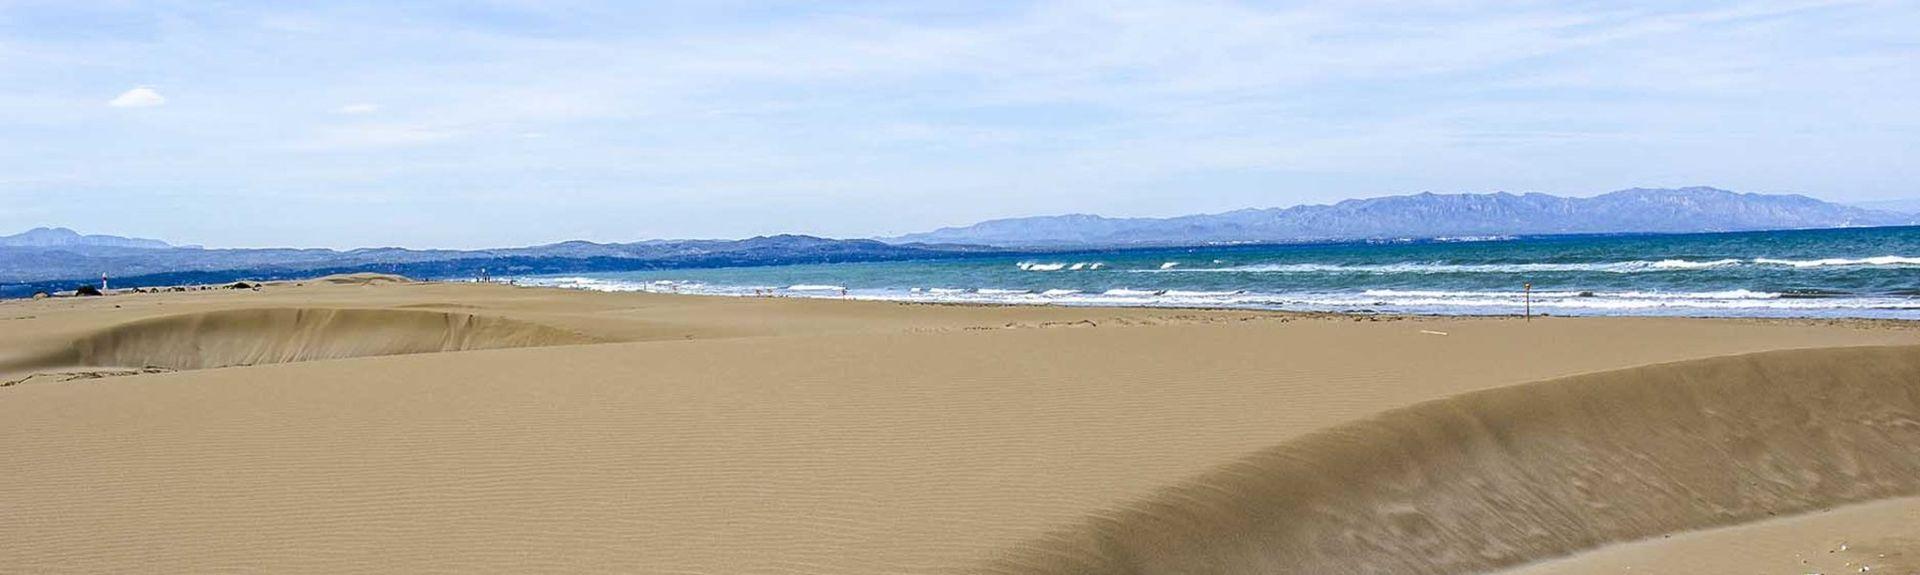 Playa de L'Ampolla, L'Ampolla, Katalonien, Spanien